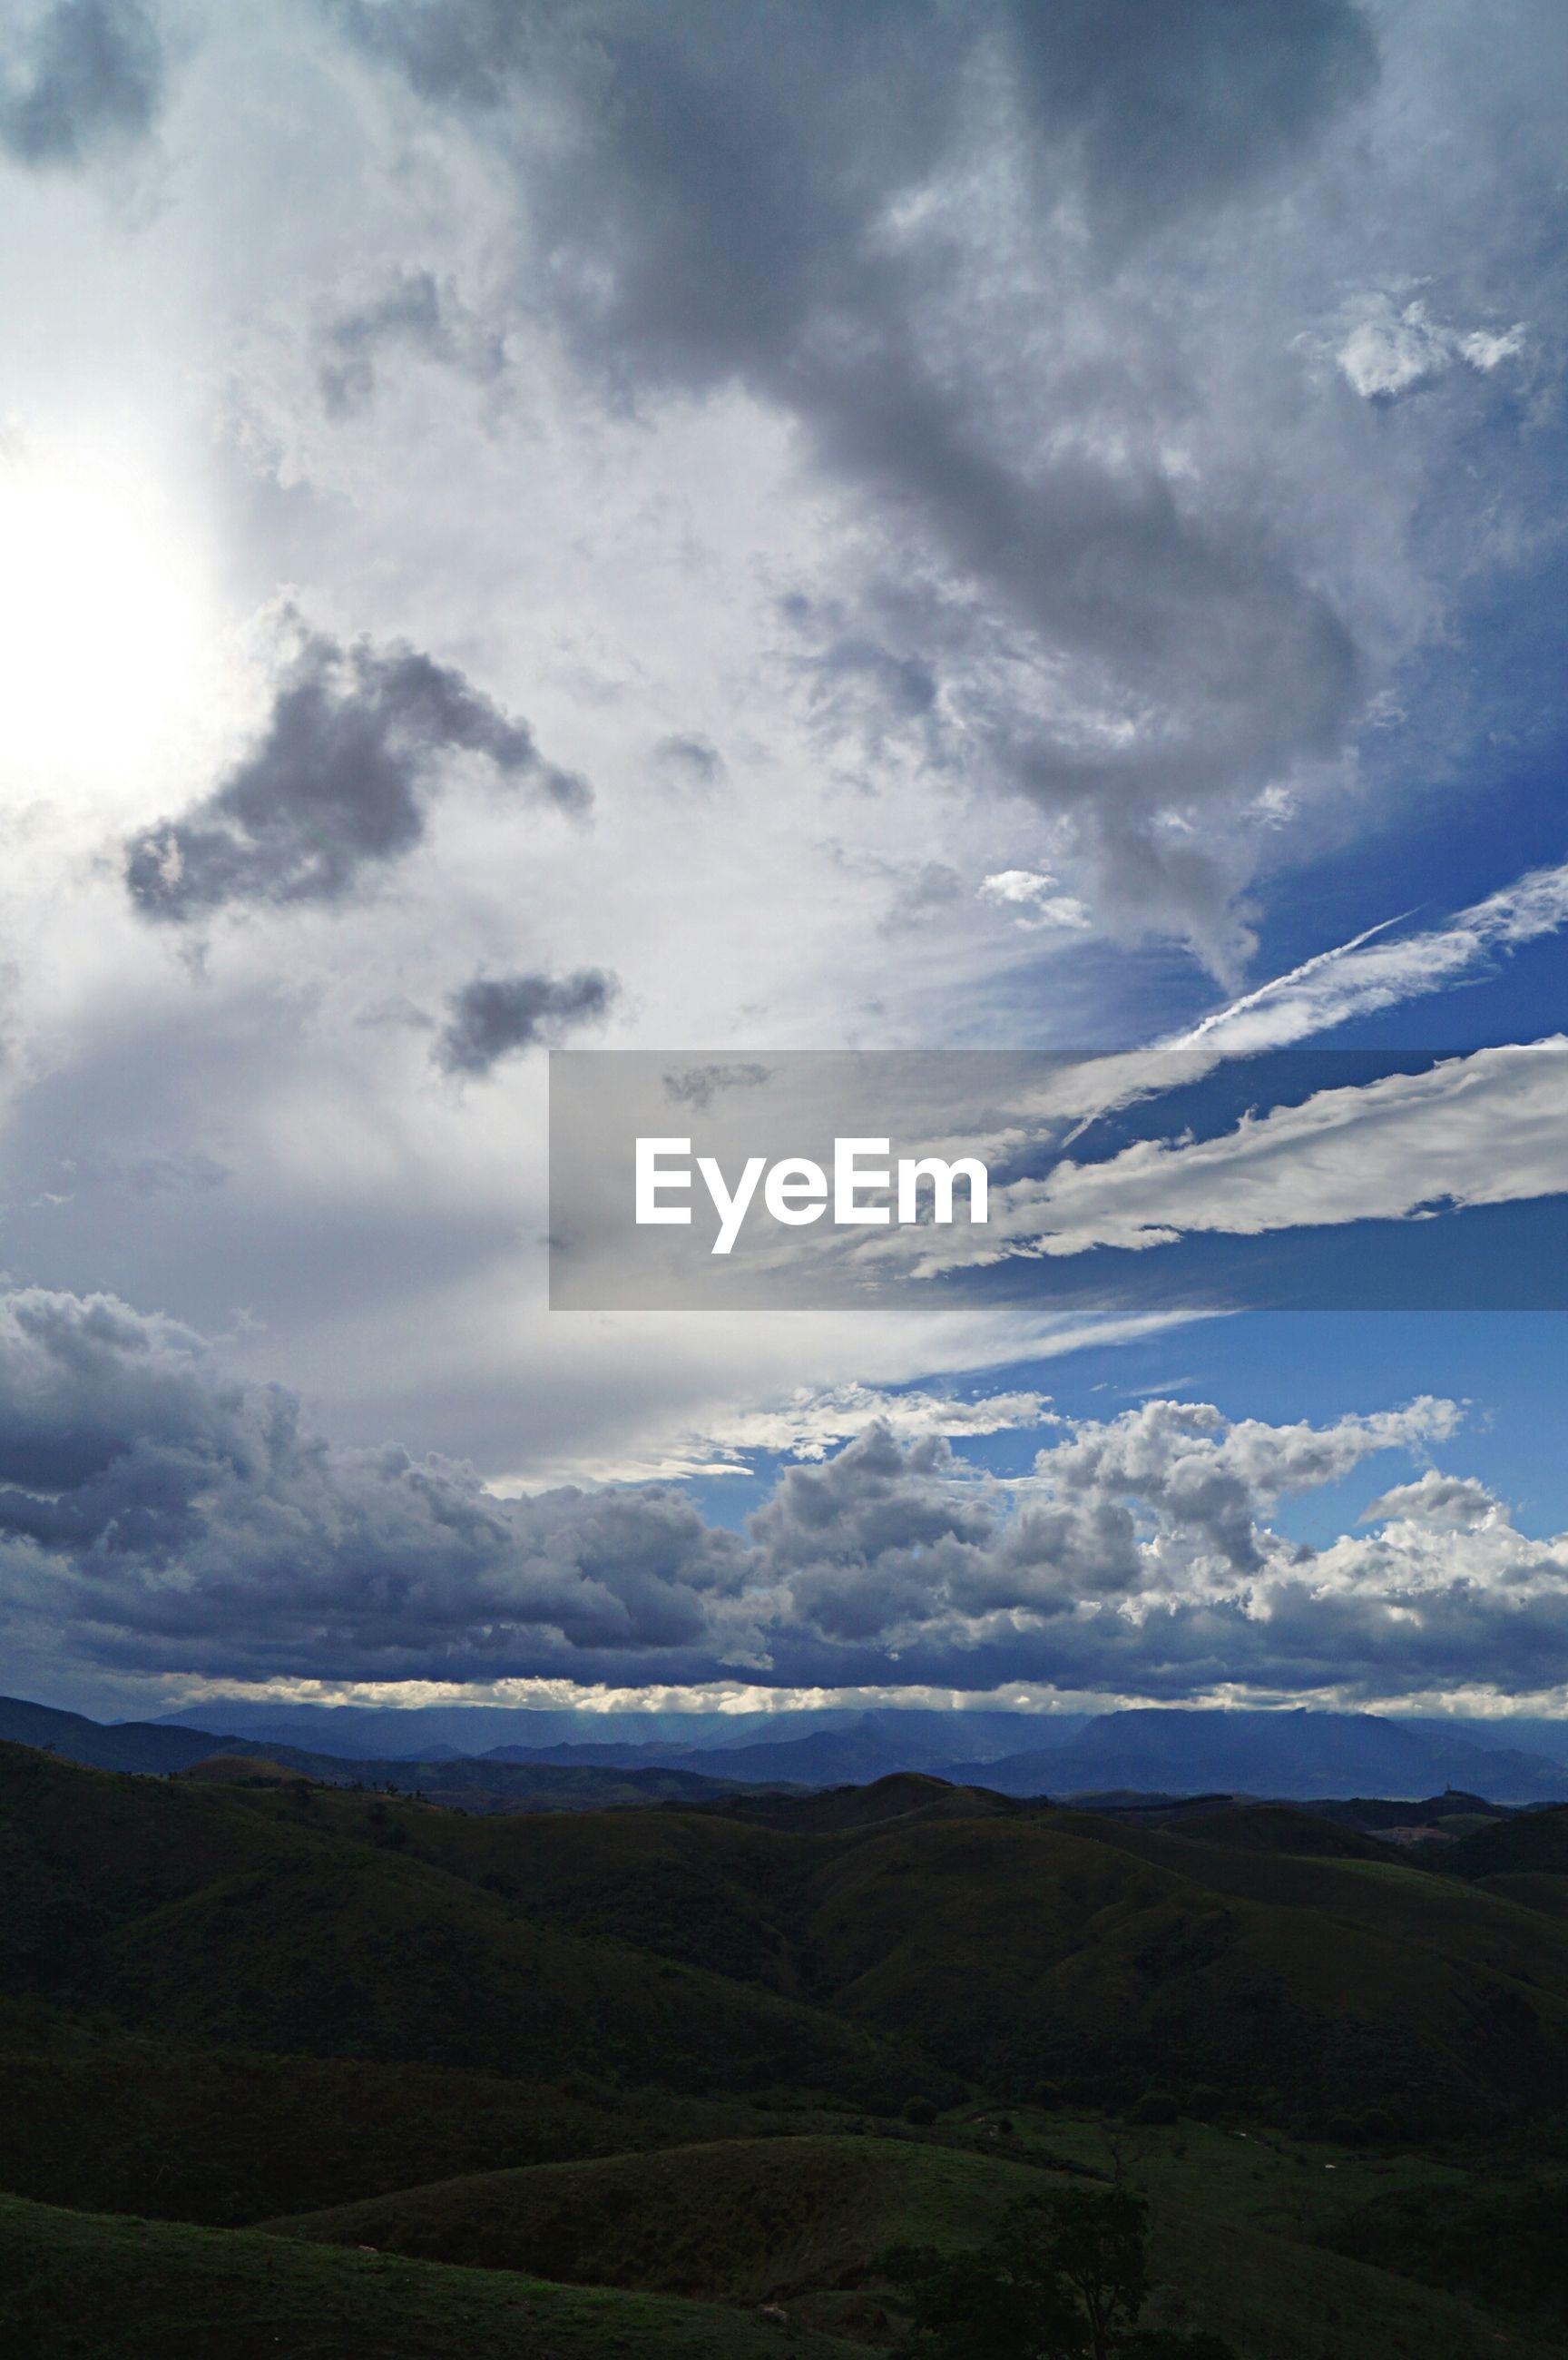 Clouds over dark hills